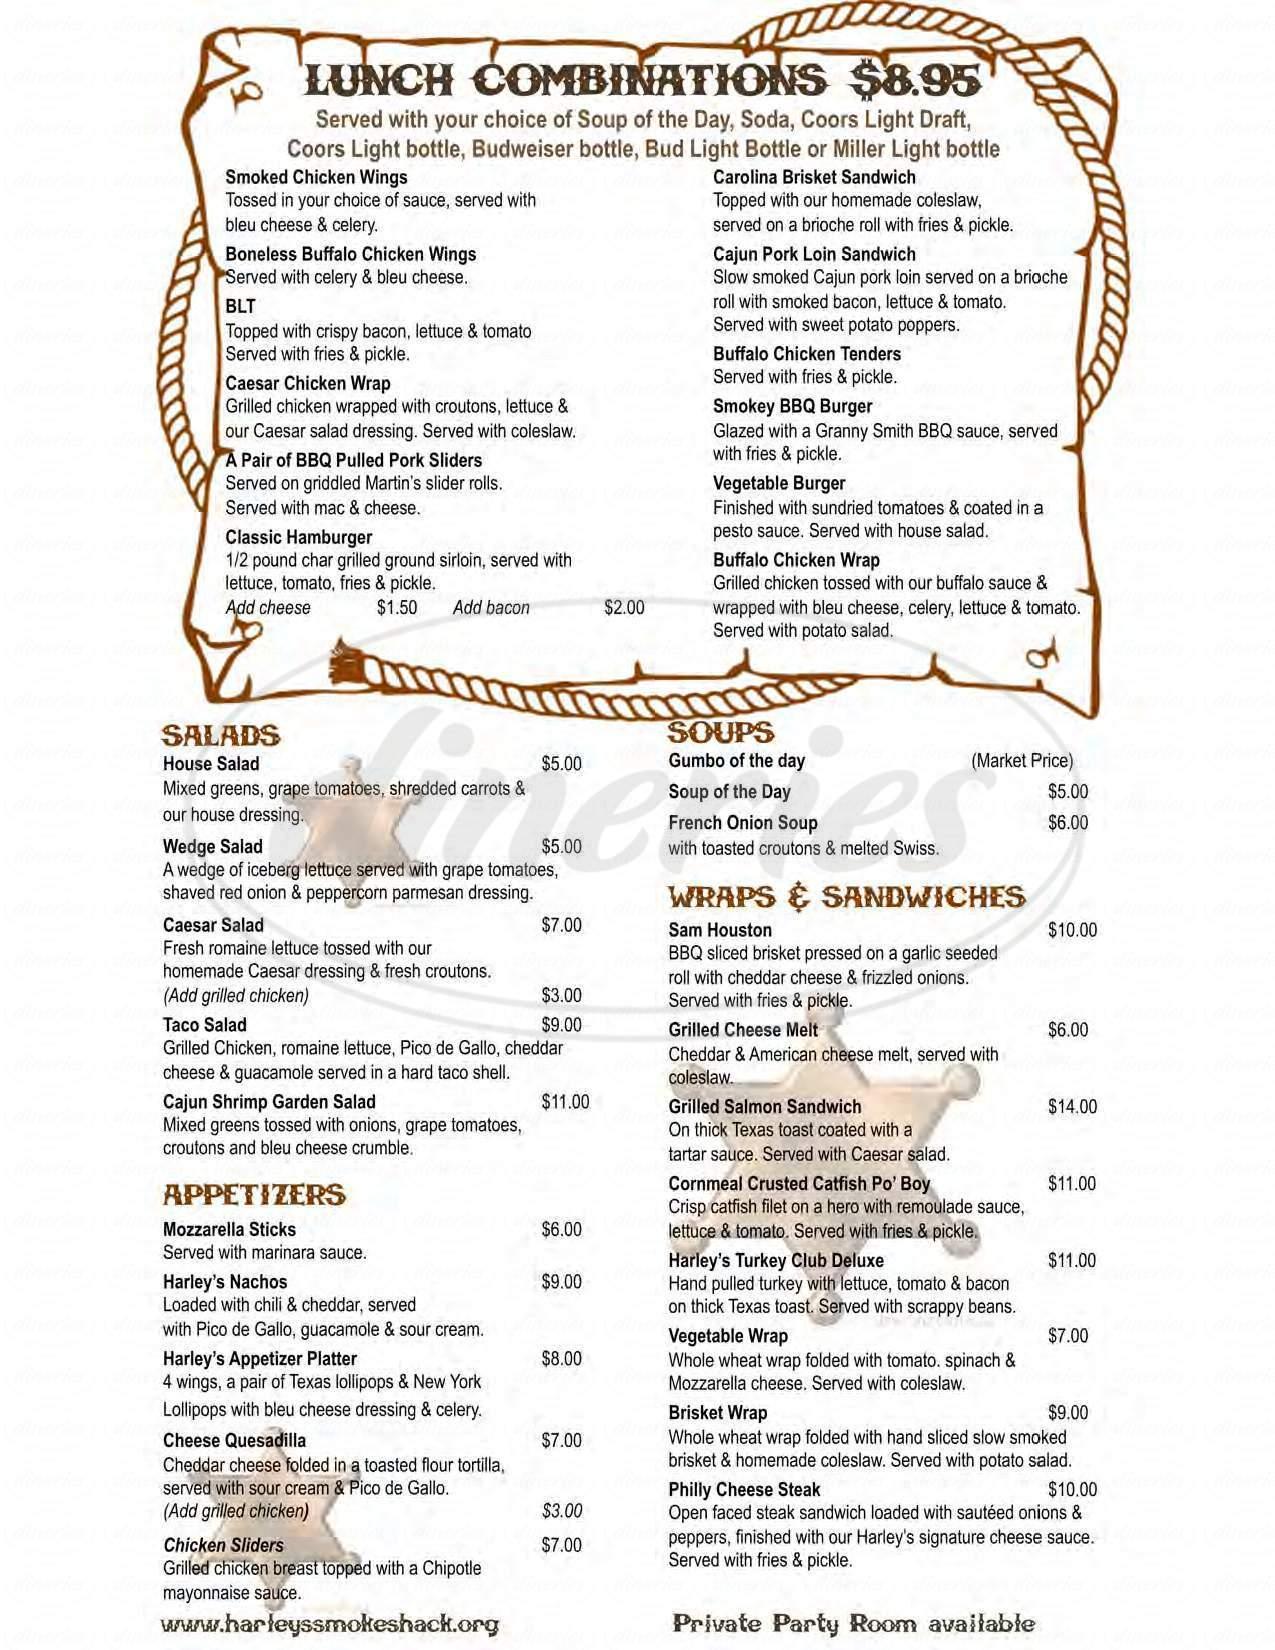 menu for Harley's Smokeshack